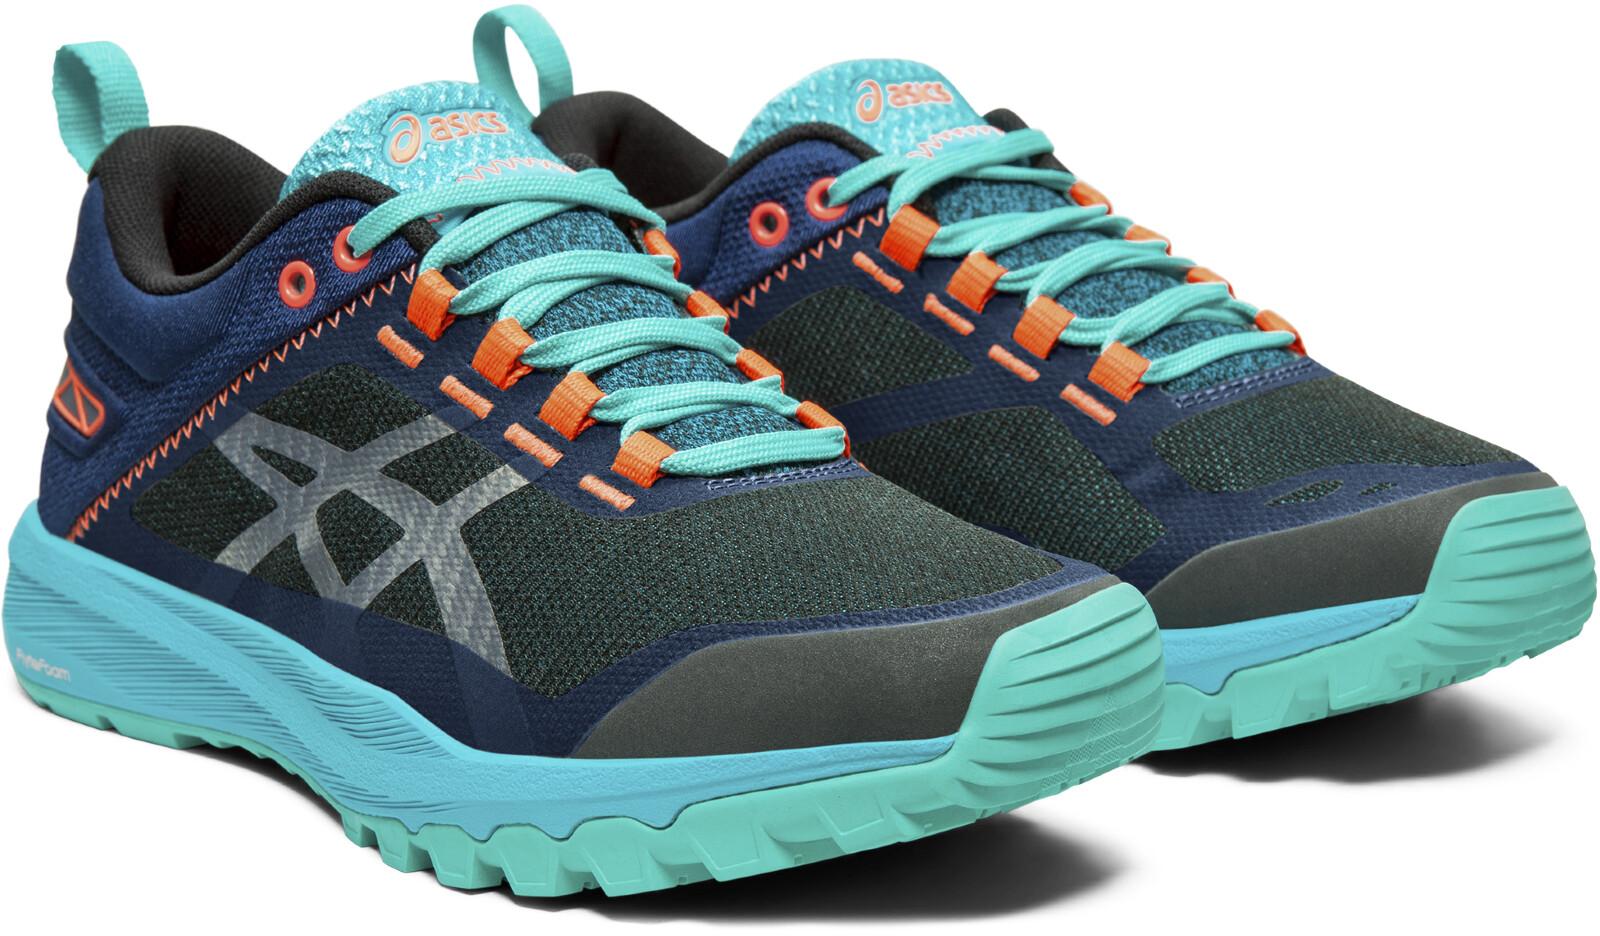 Asics GEL Odyssey Wr Men's Low Rise Hiking Shoes Asics Gel